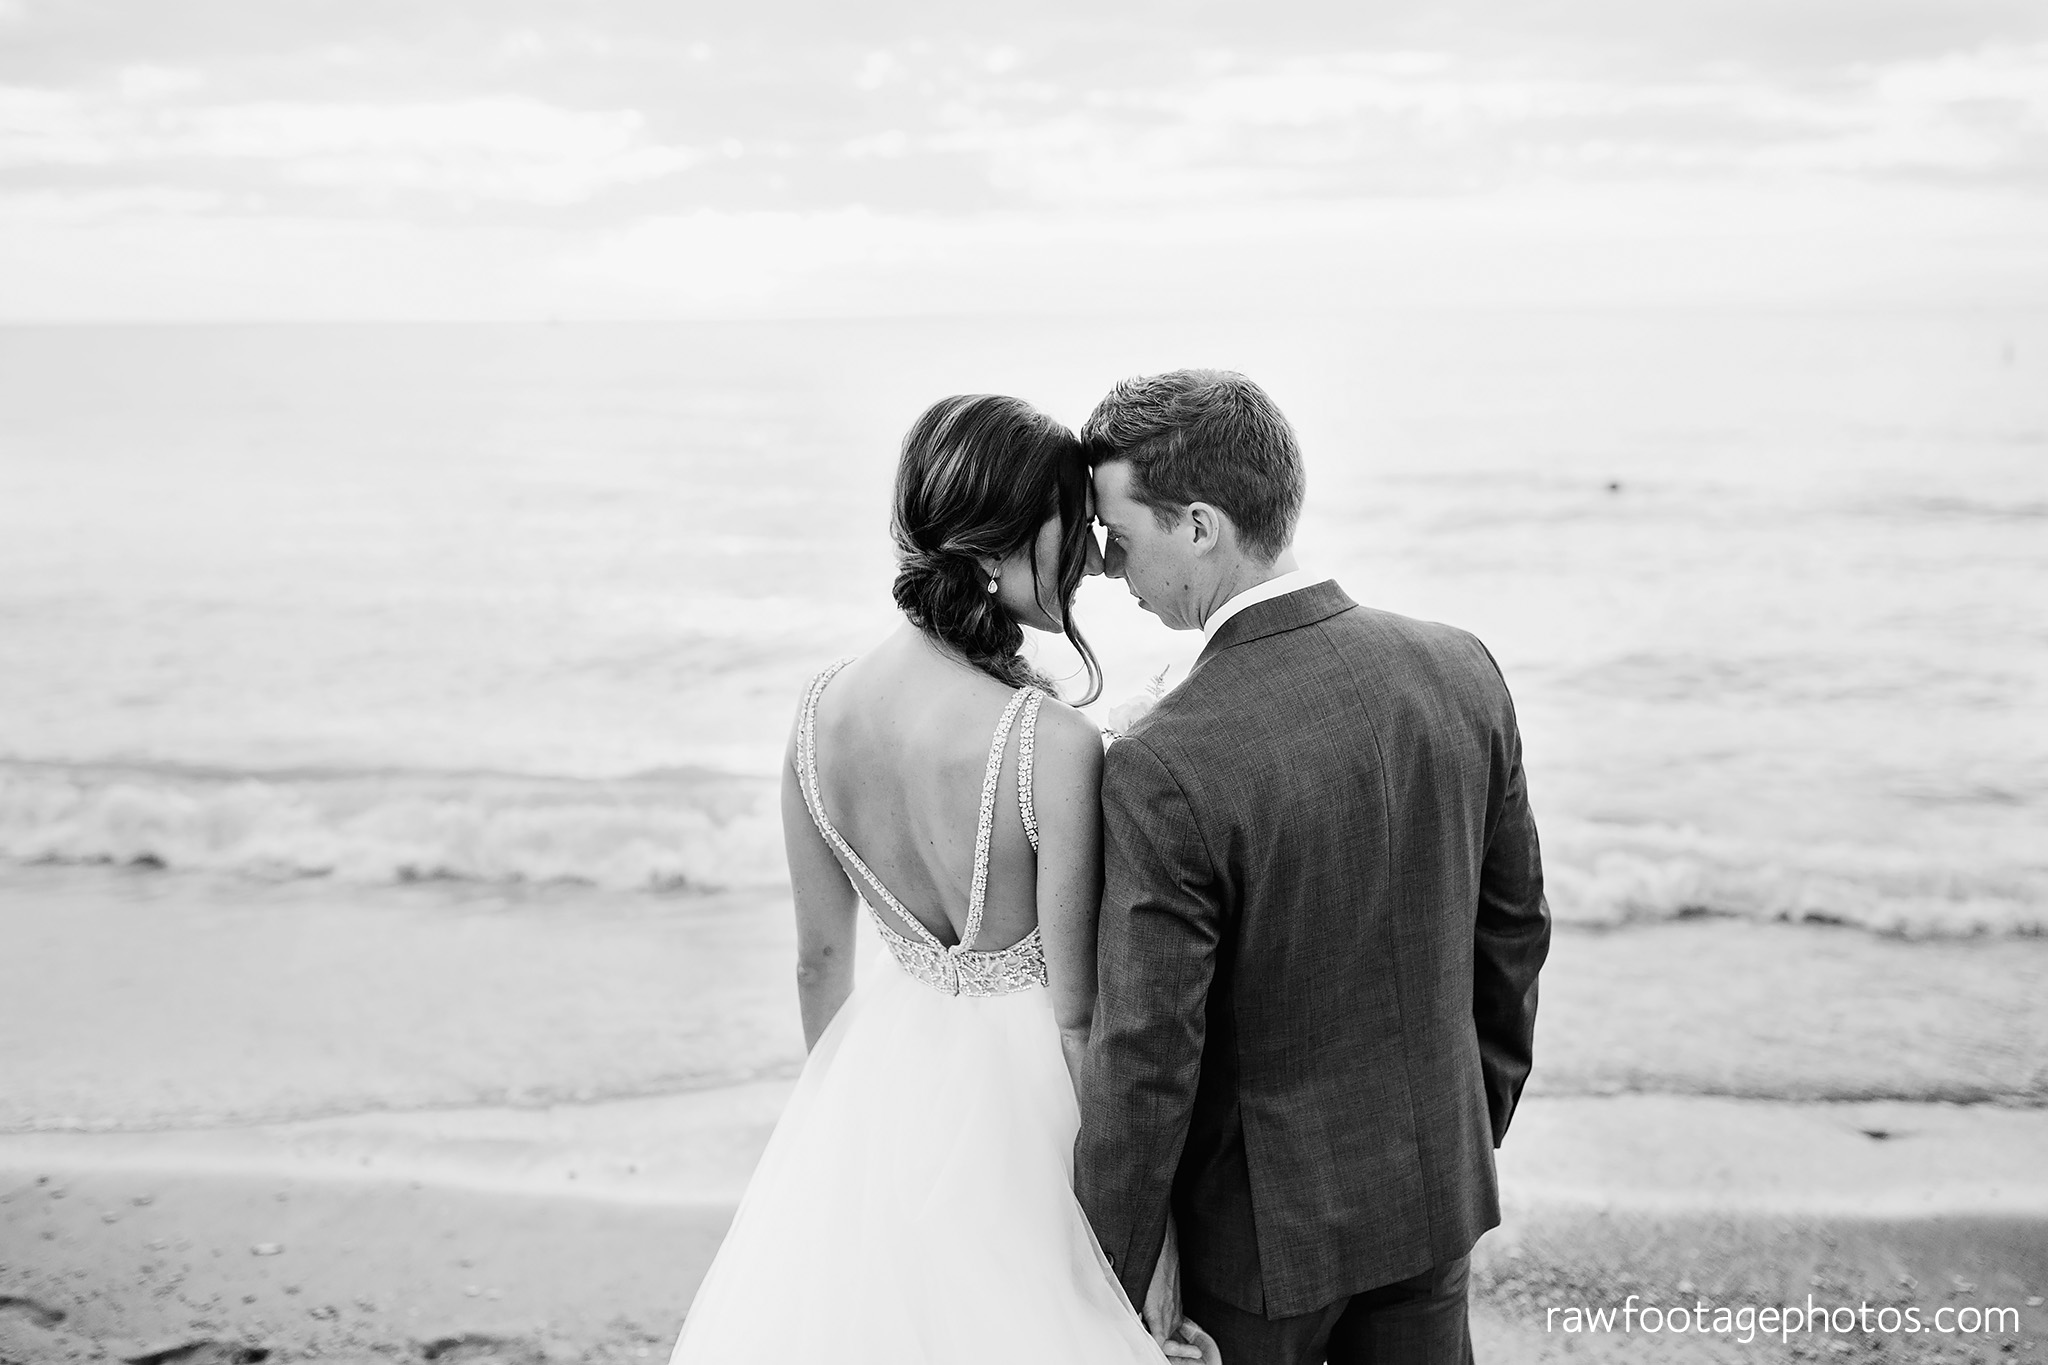 london_ontario_wedding_photographer-grand_bend_wedding_photographer-oakwood_resort_wedding-beach_wedding-sunset_wedding-raw_footage_photography065.jpg